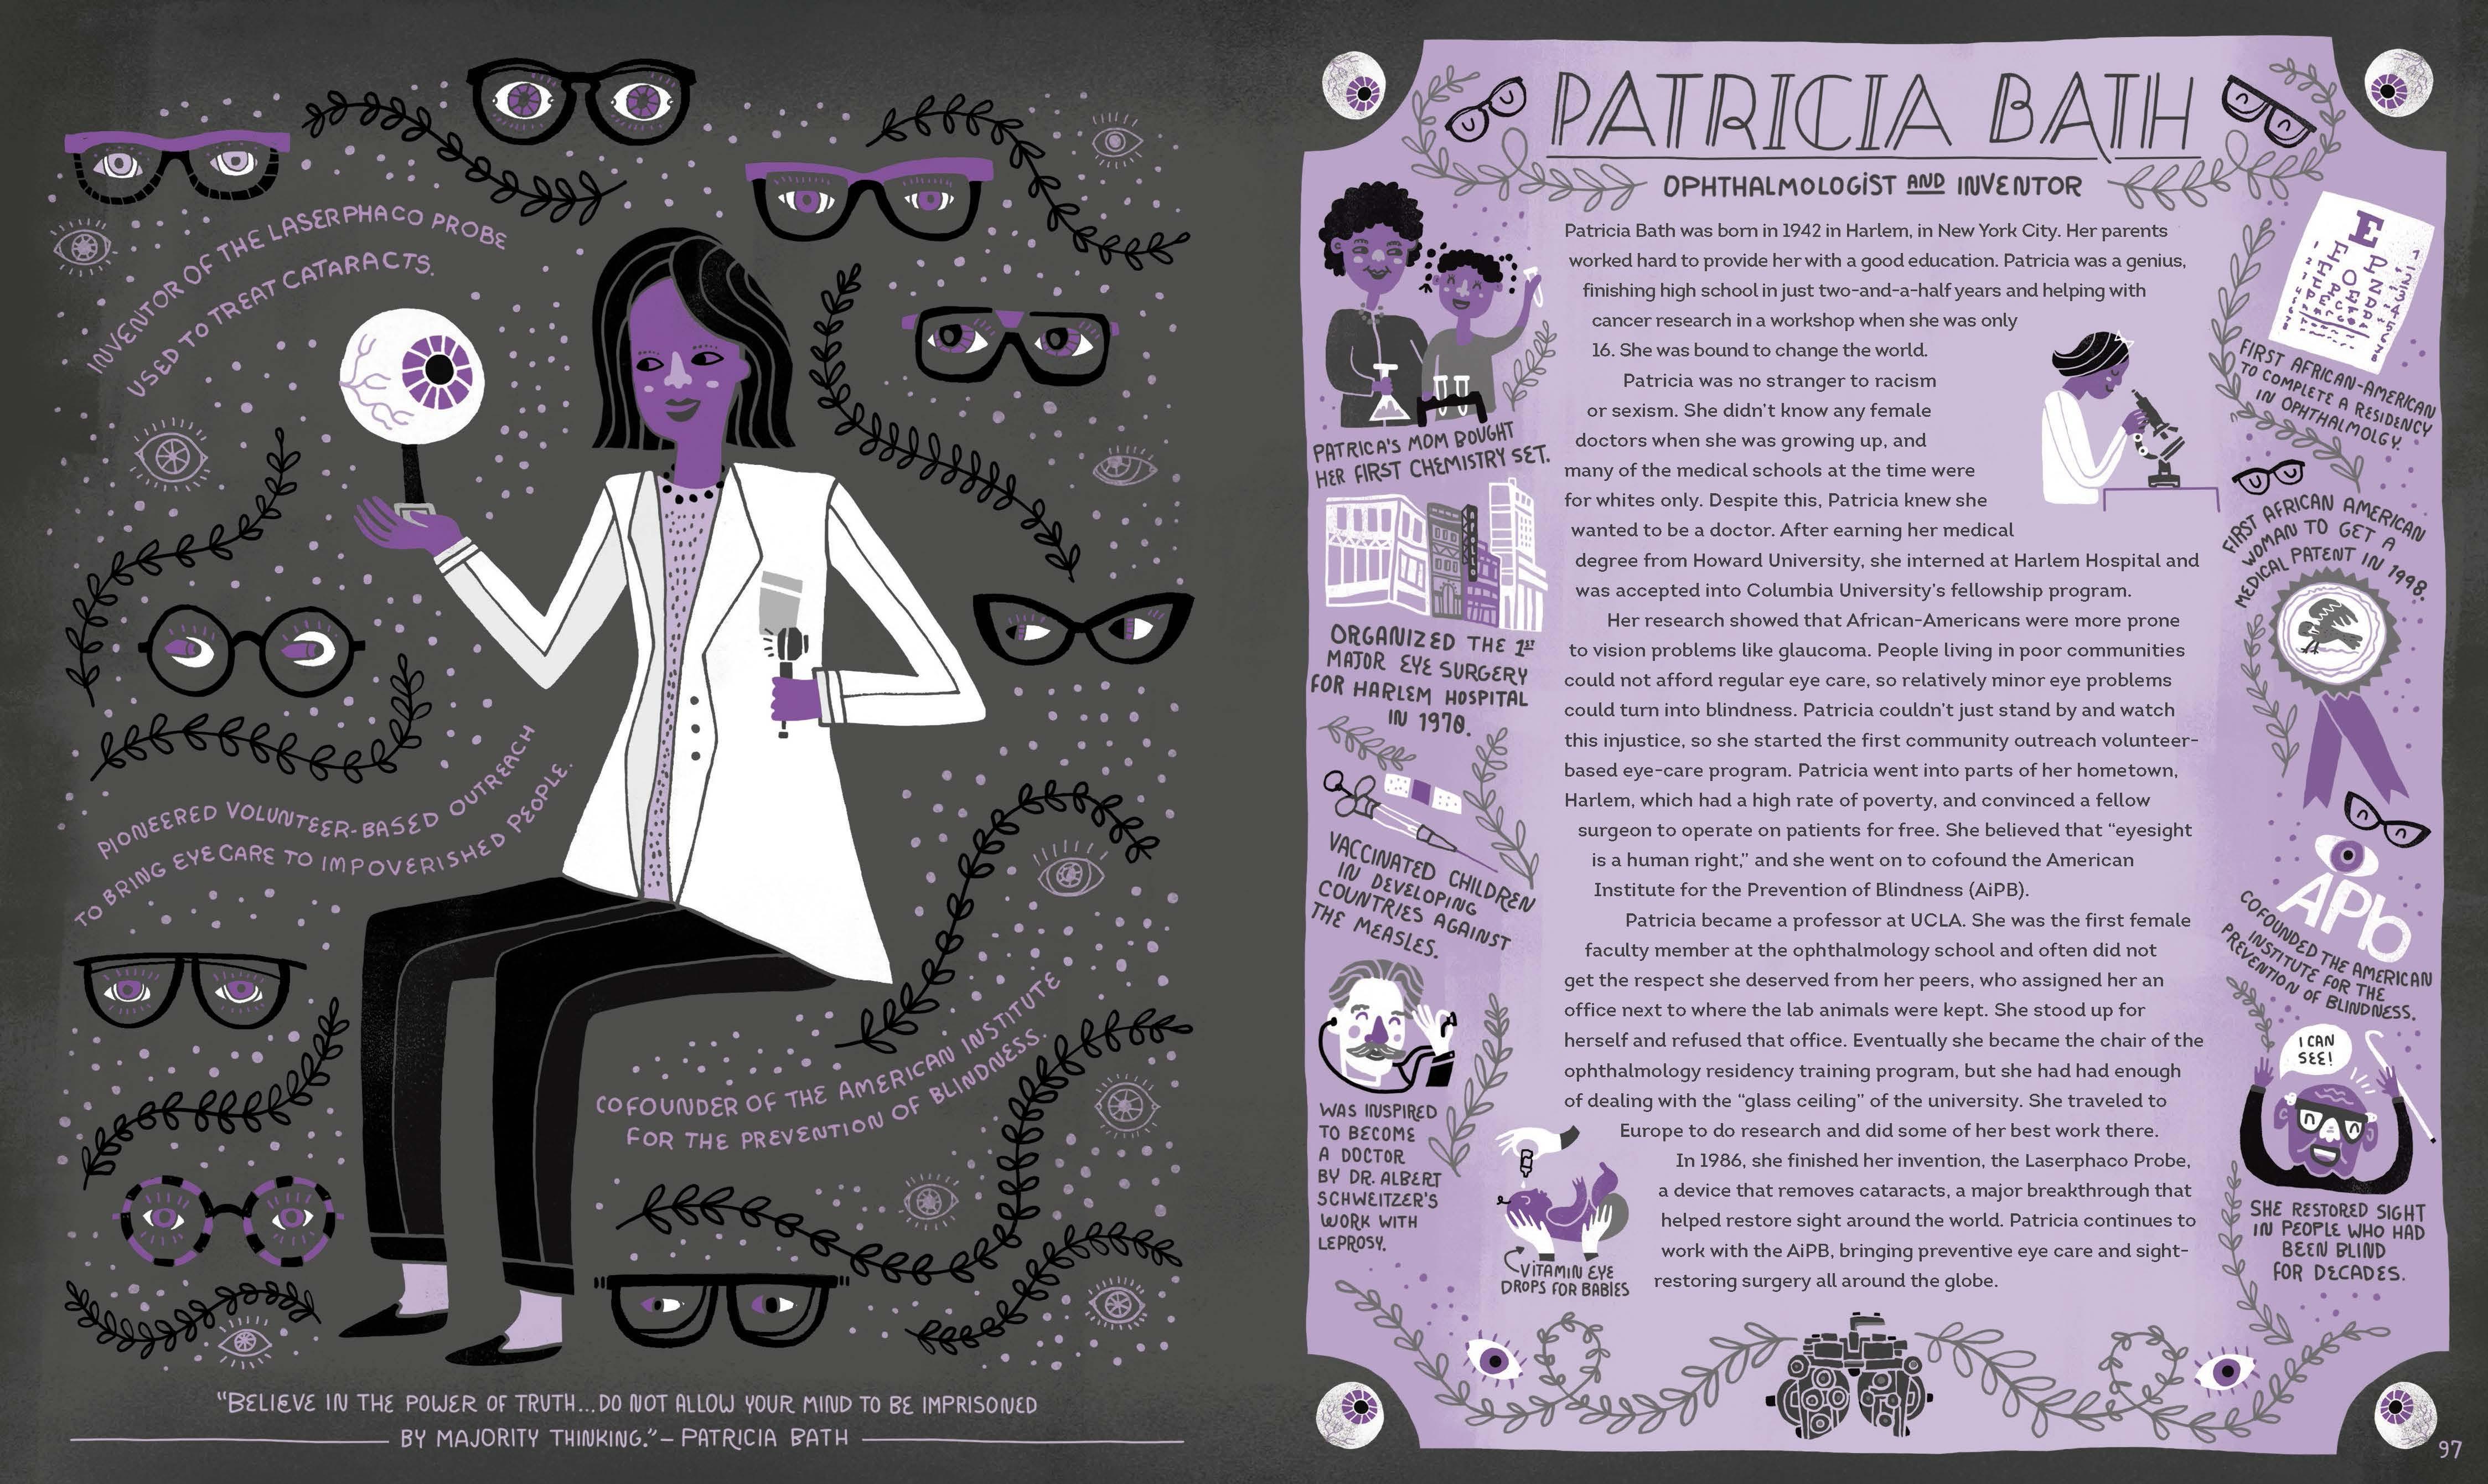 Rachel Ignotofsky_Patricia Bath